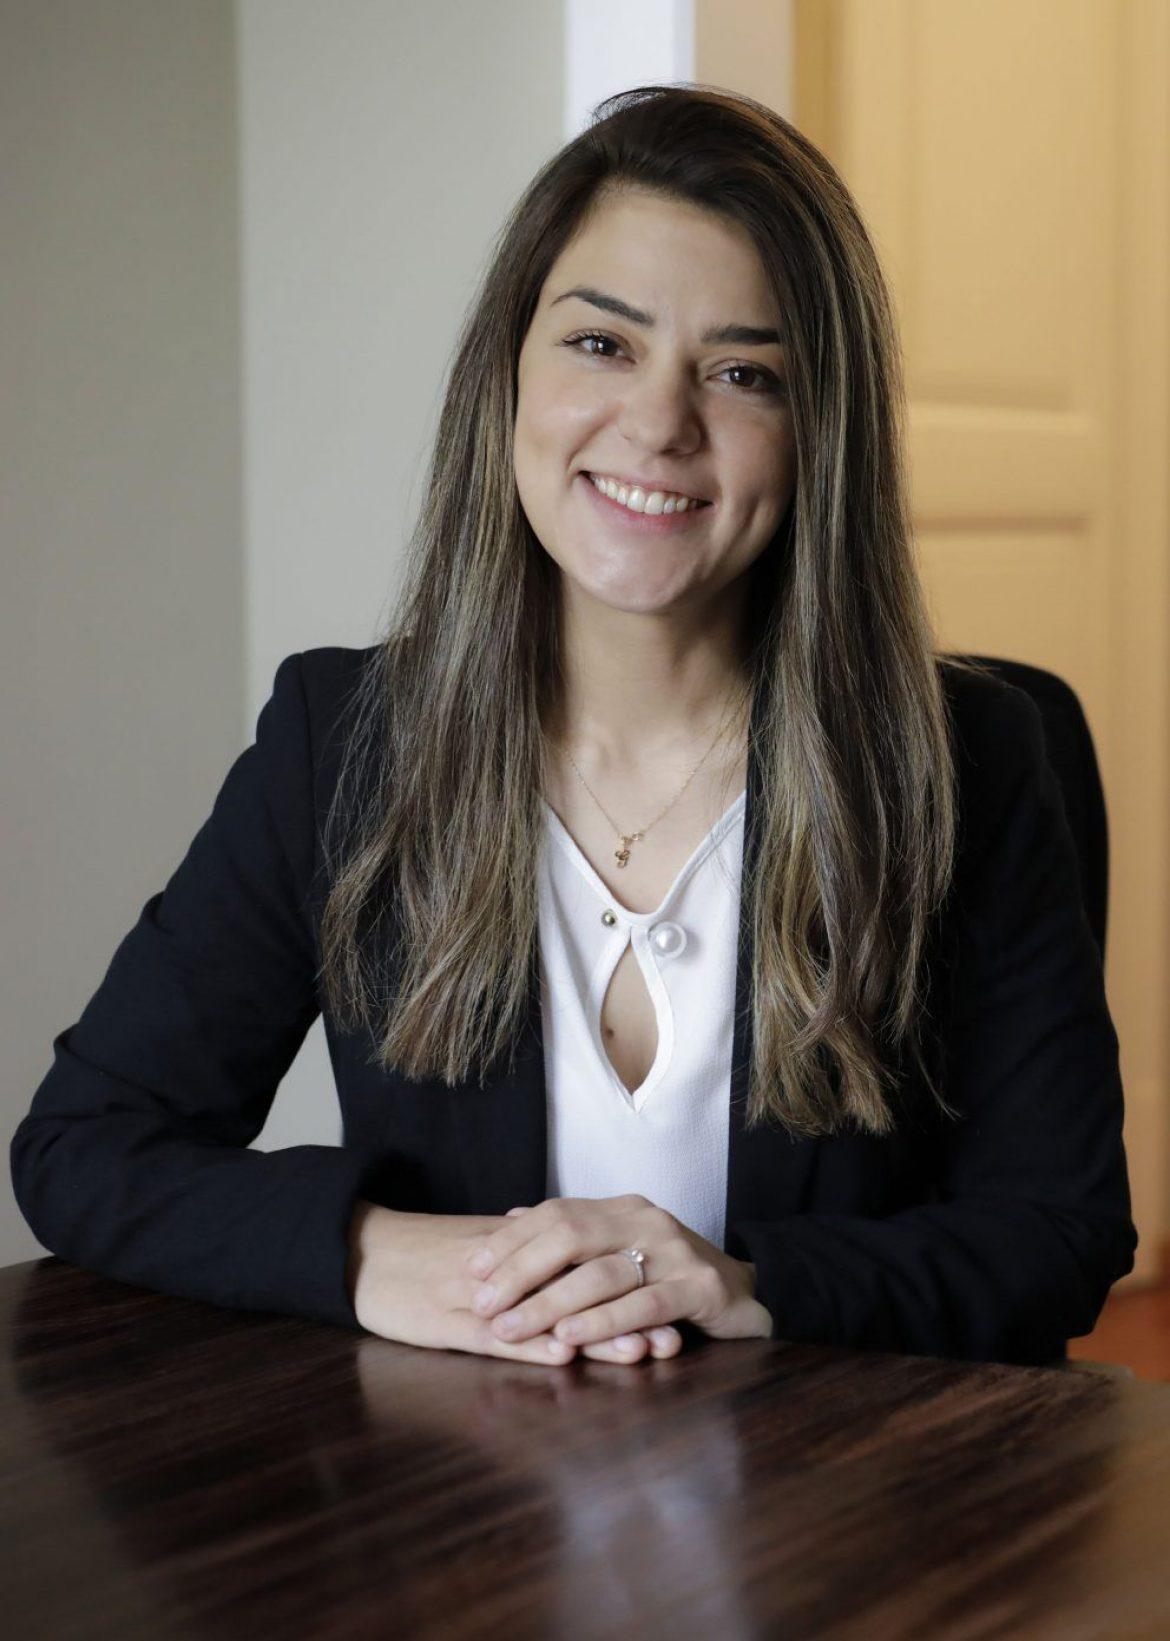 Gisela Rodolao Baez